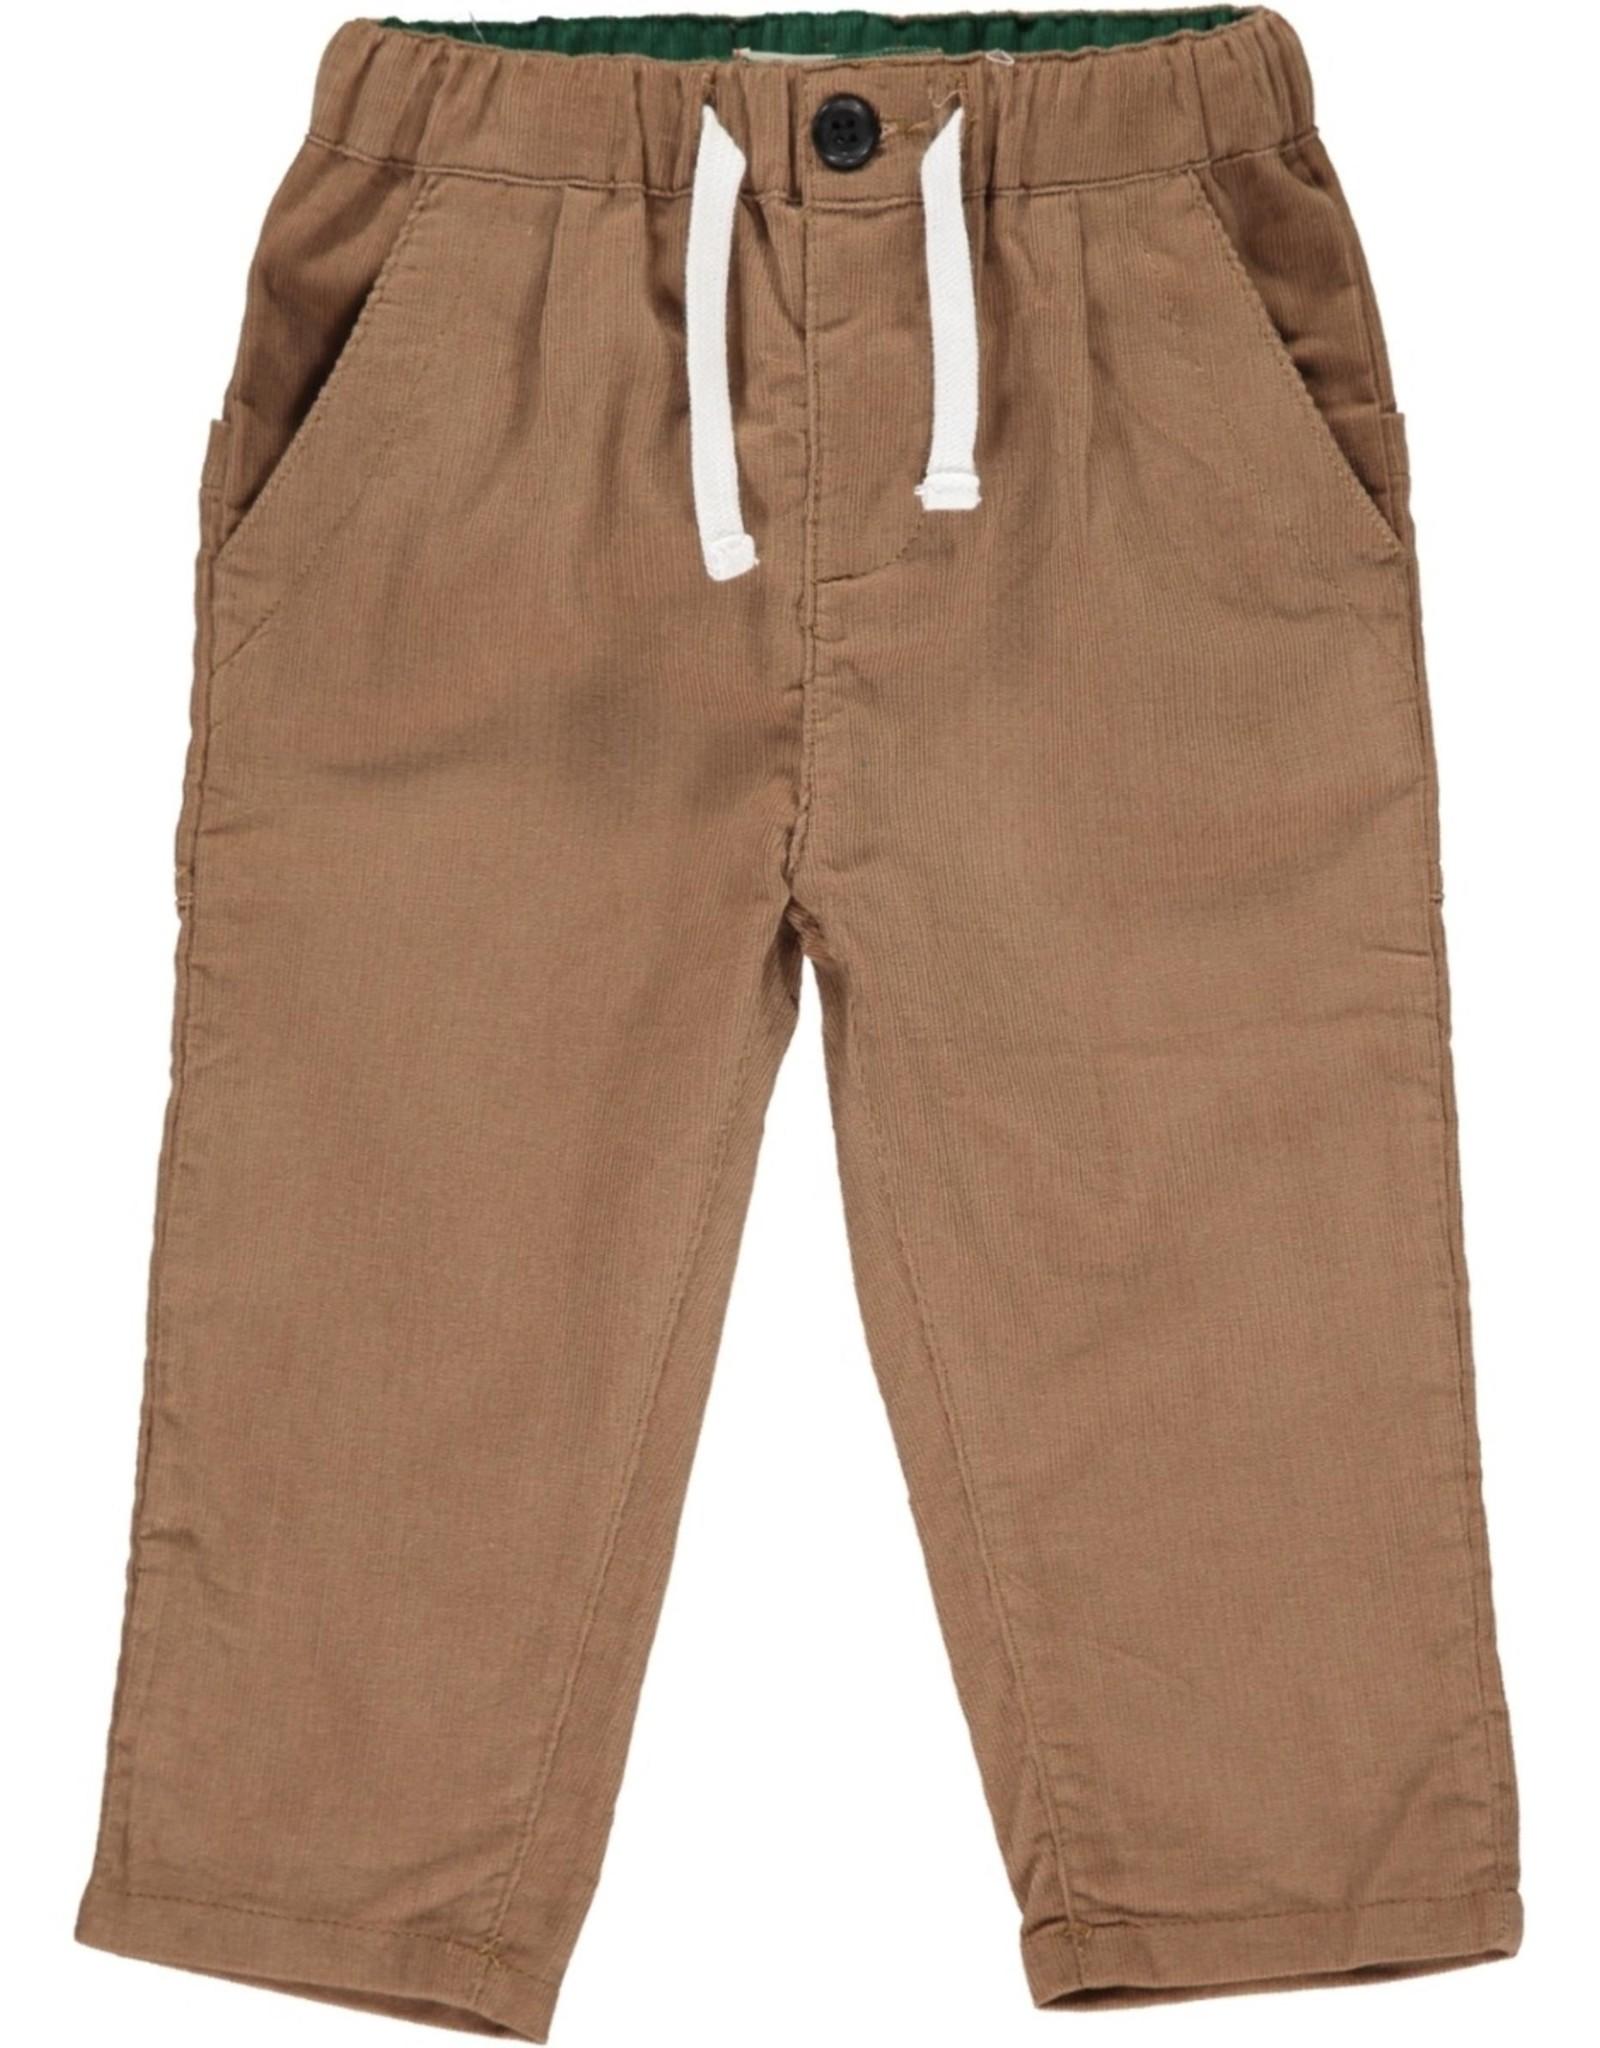 Me & Henry cord pant- brown